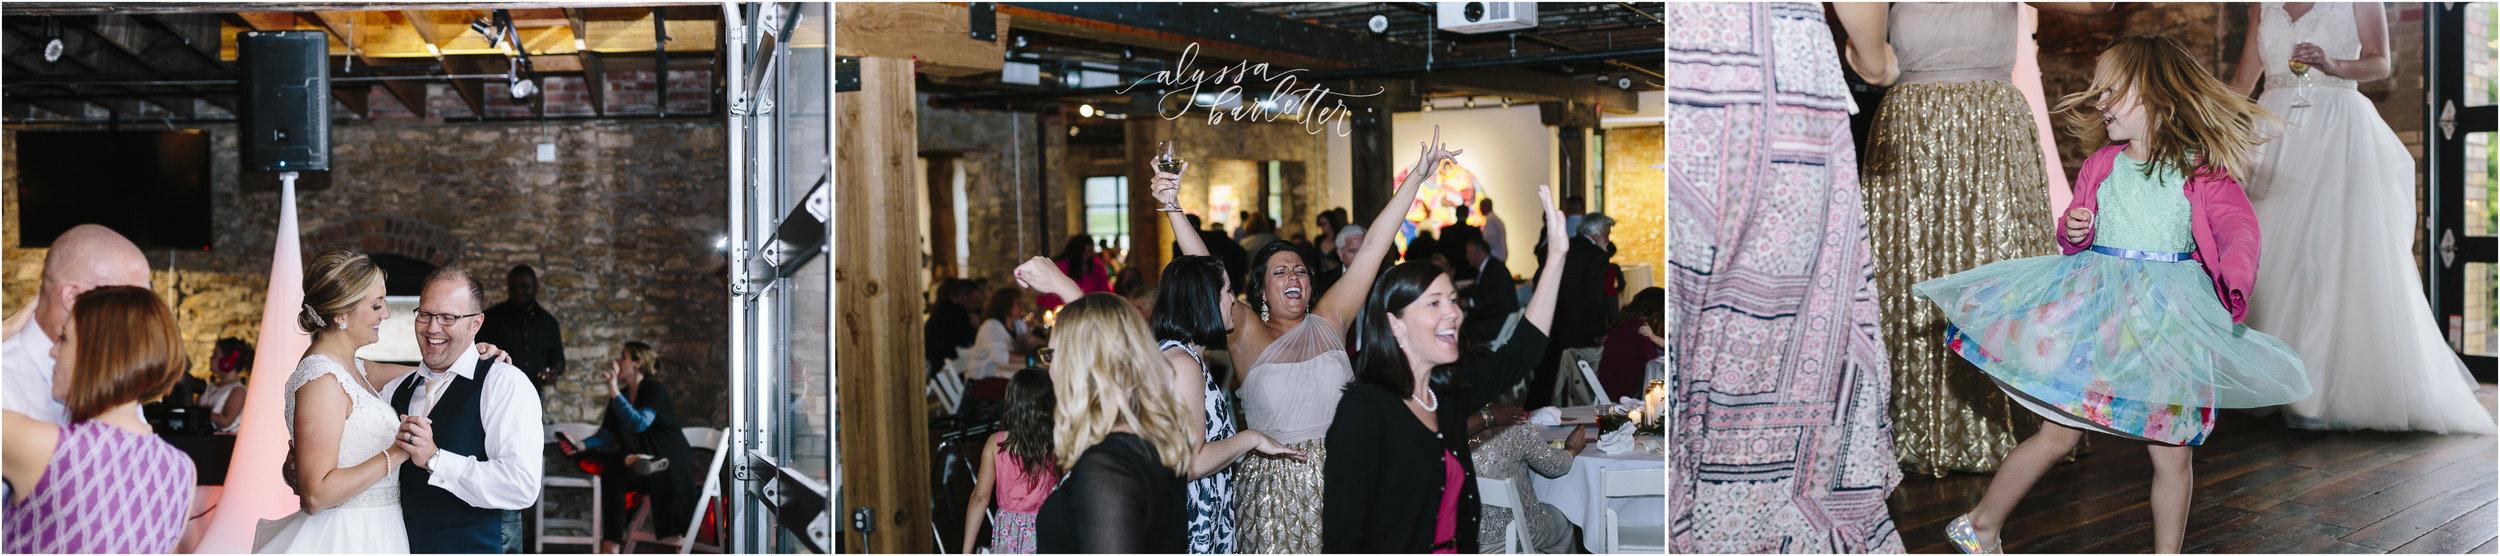 alyssa barletter photography cider gallery lawrence kansas rainy day wedding megan and brett-1-54.jpg